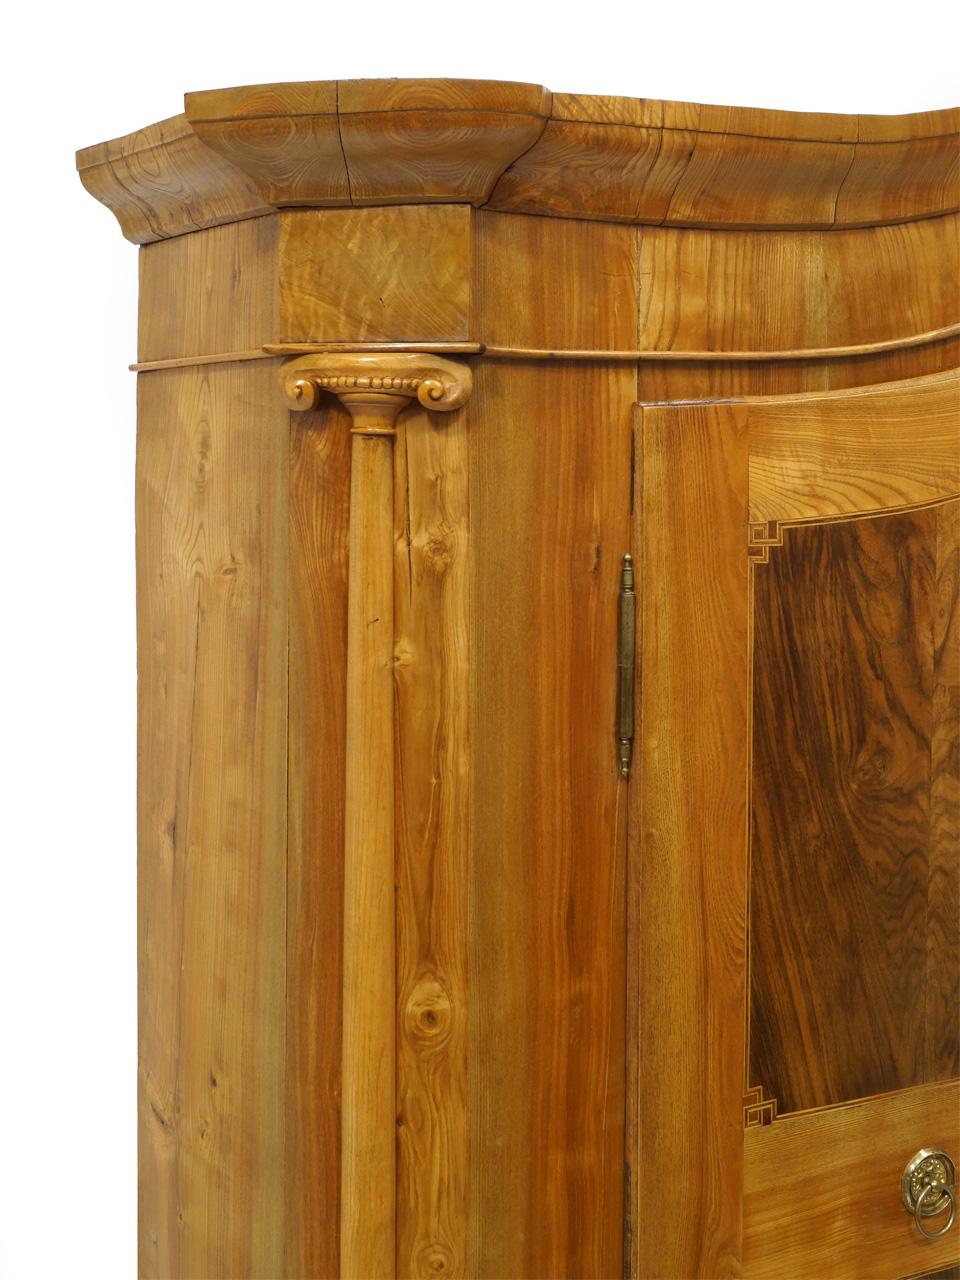 art nr 407 bodenseeschrank r ster nussbaum um 1800. Black Bedroom Furniture Sets. Home Design Ideas